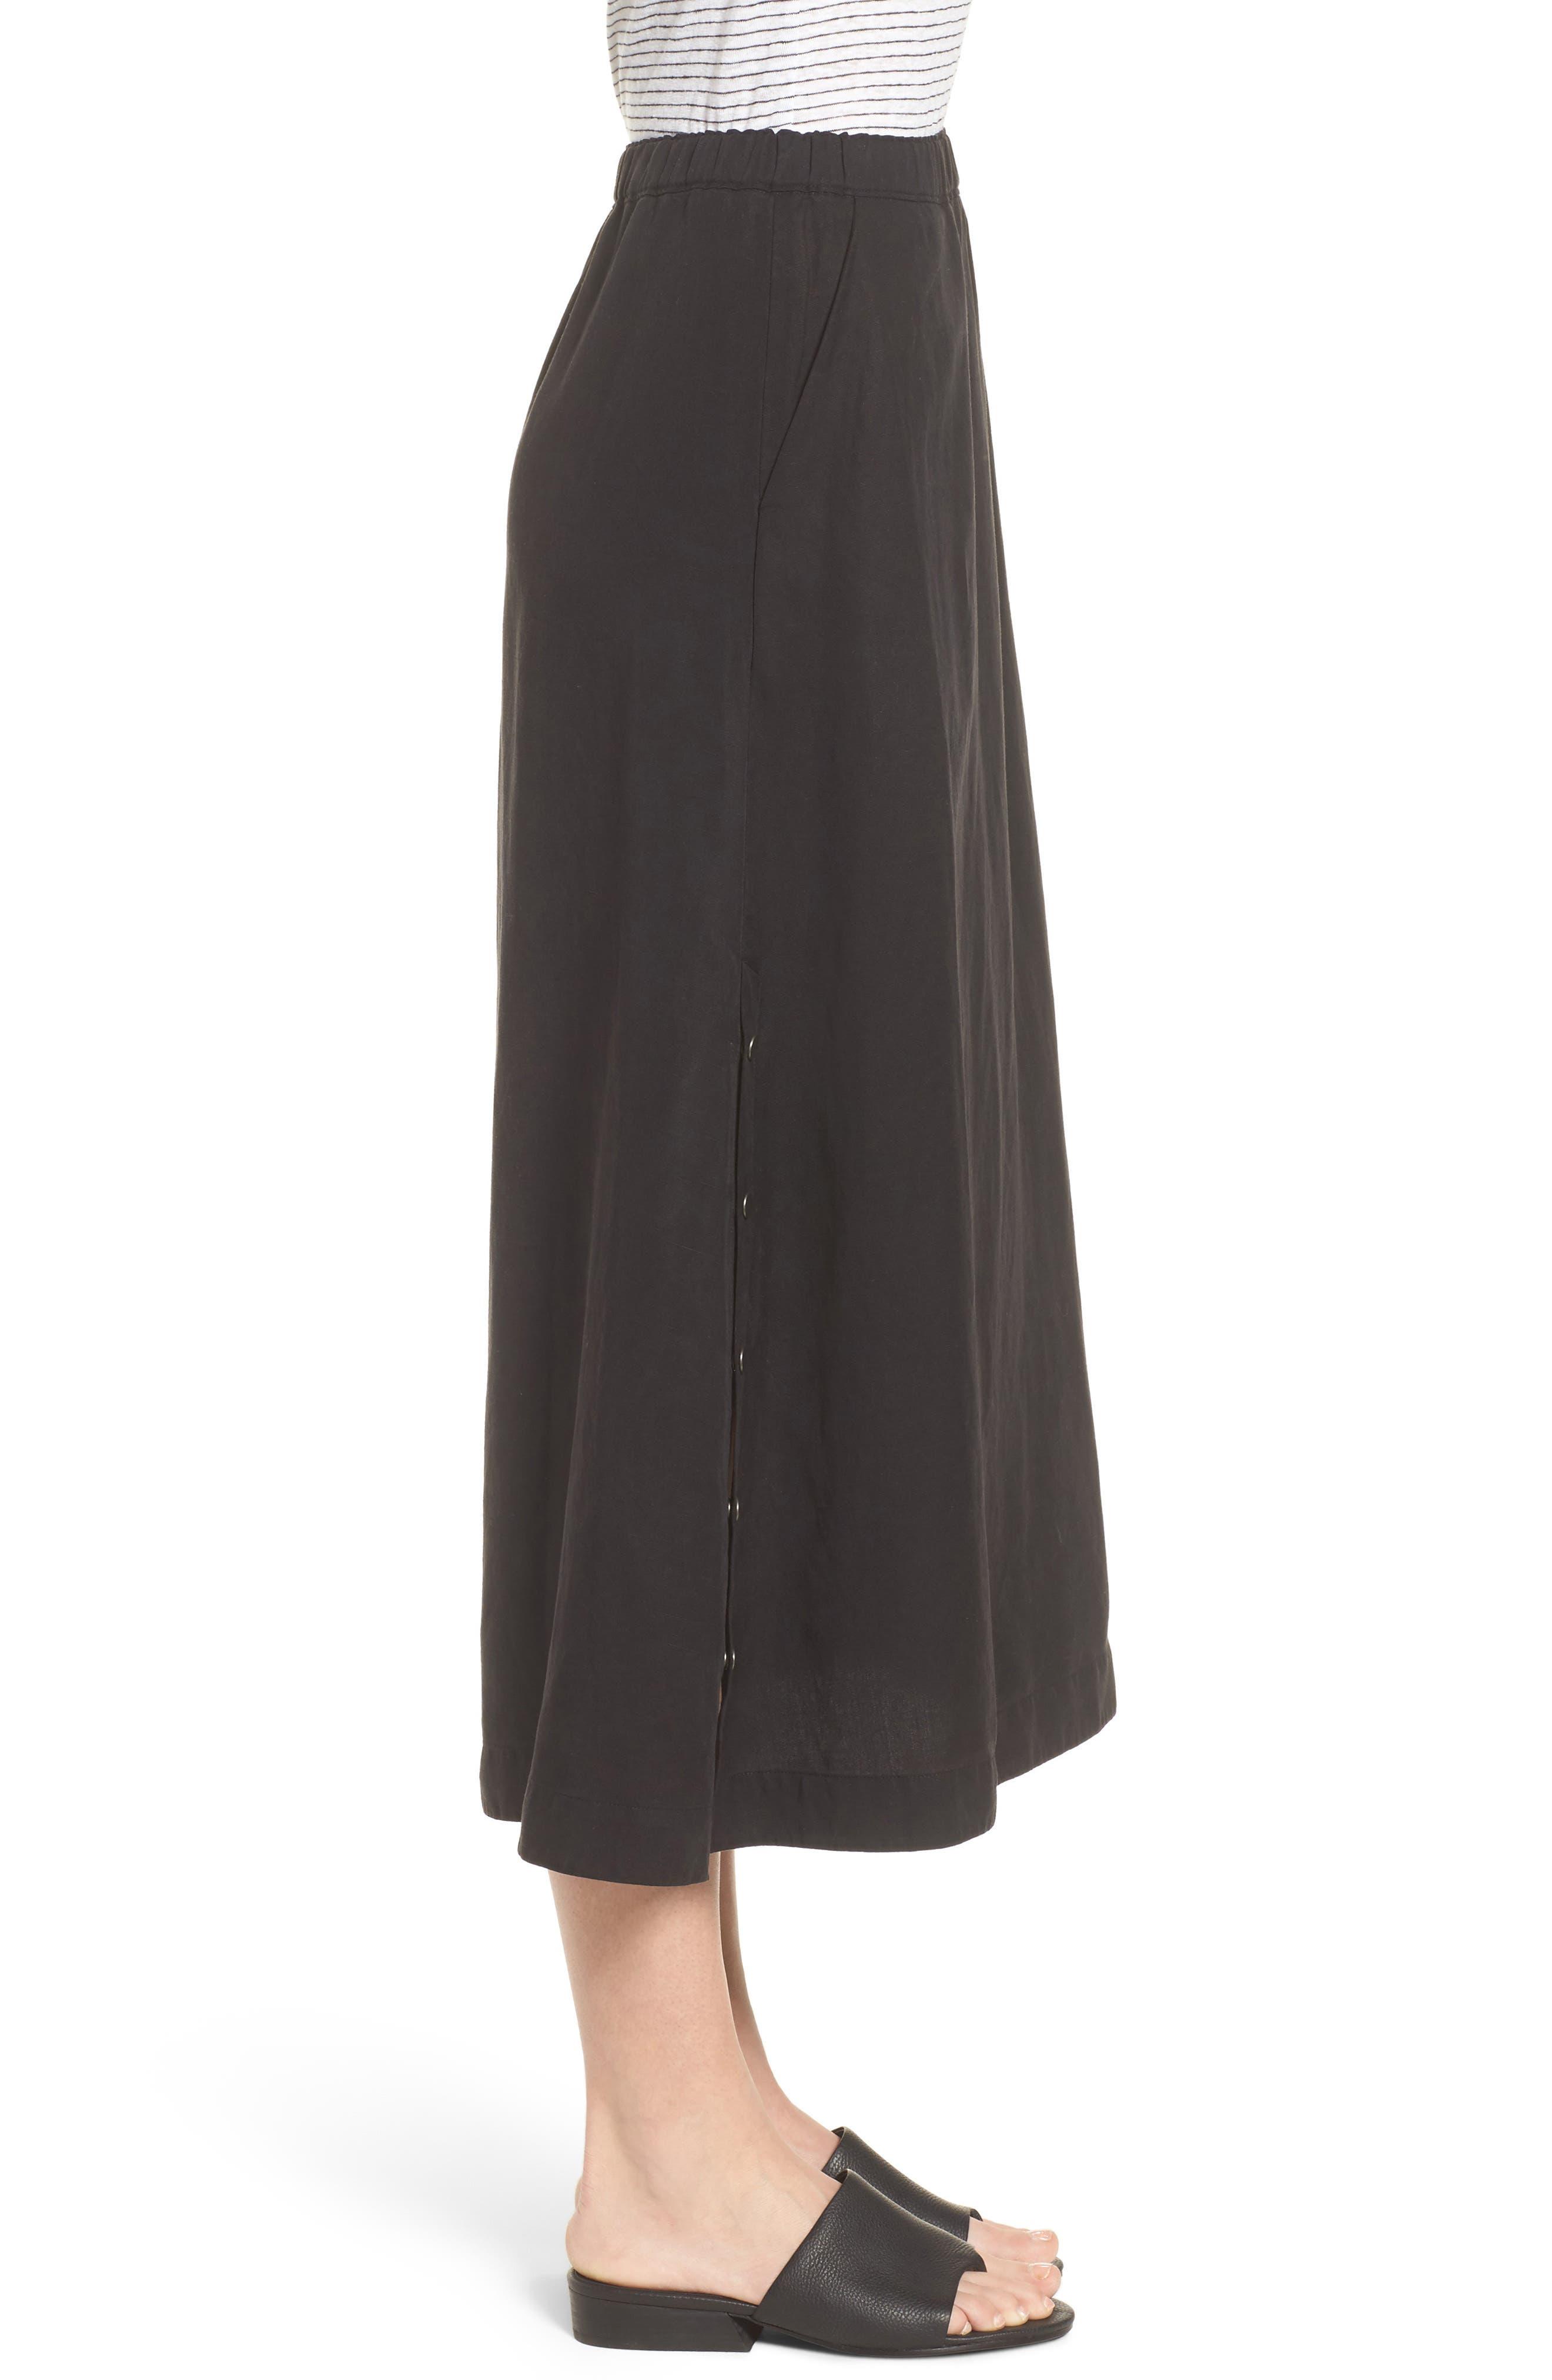 Tencel<sup>®</sup> Lyocell & Linen Midi Skirt,                             Alternate thumbnail 3, color,                             Black